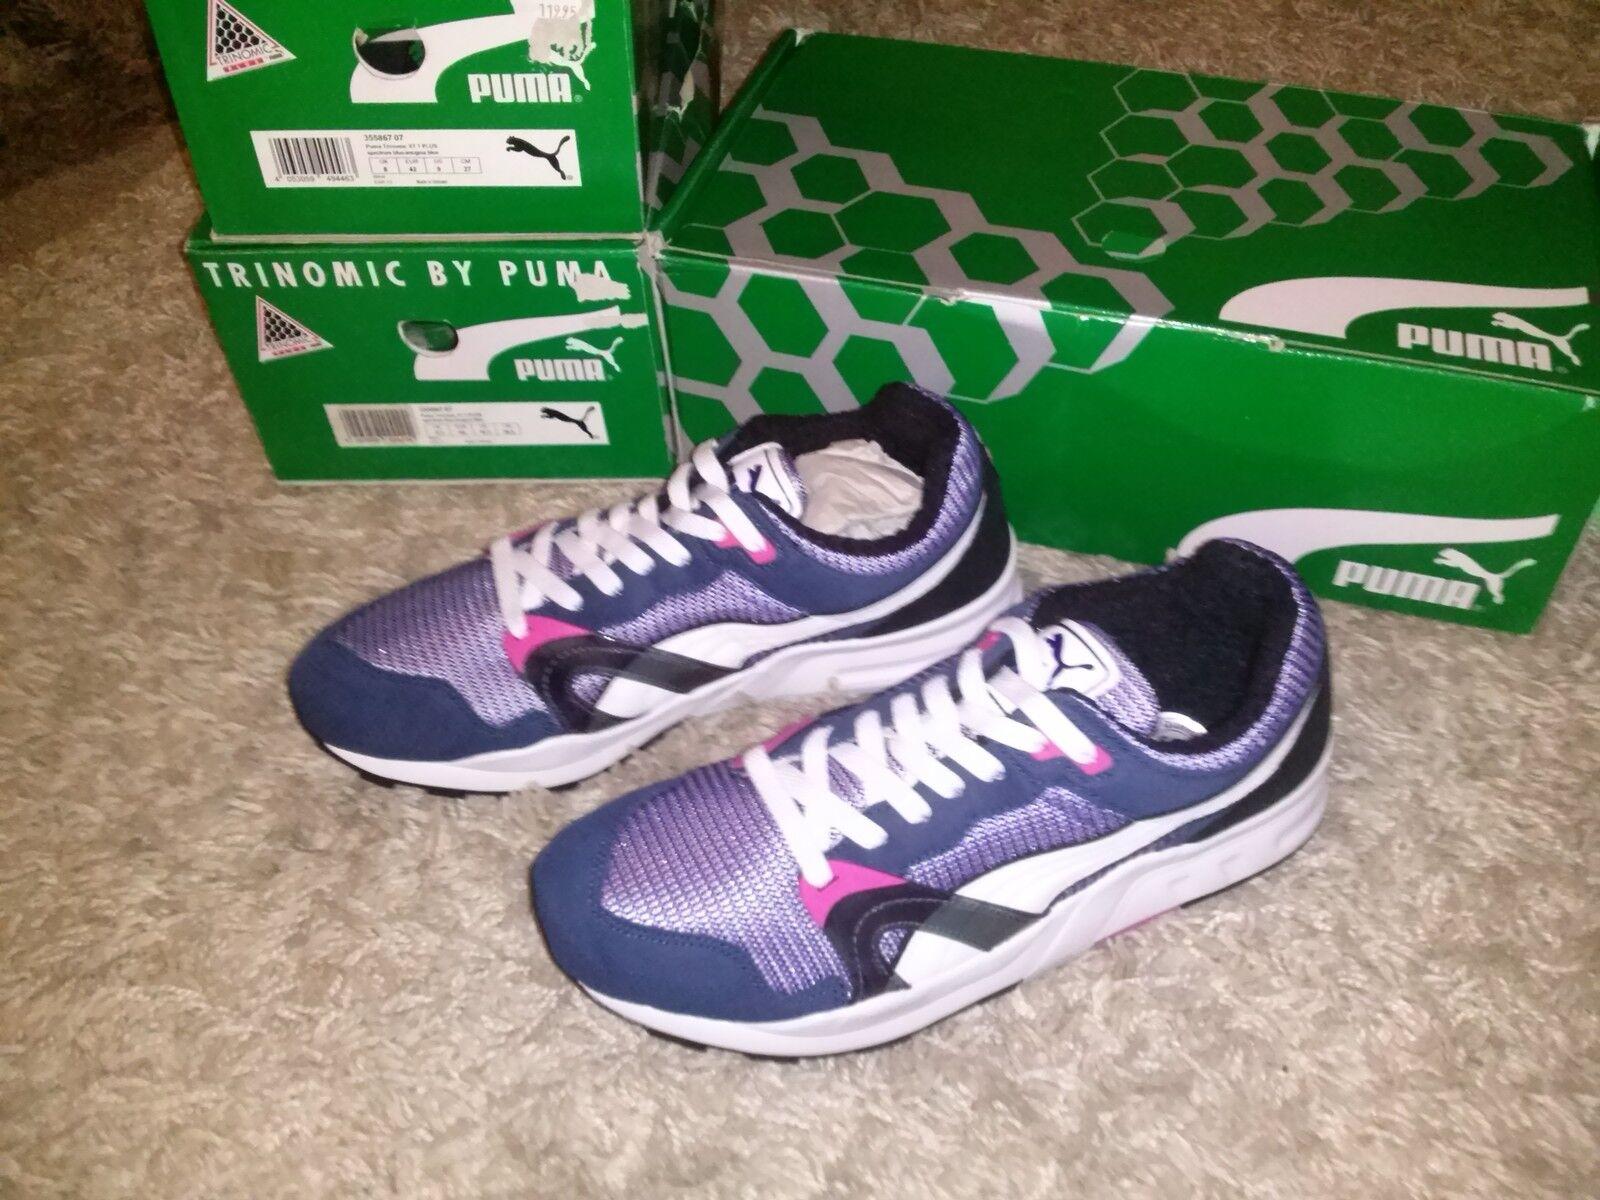 Puma Trinomic XT 1 Plus Spectrum 35586707 Klassiker Herren Sneaker blue-insignia